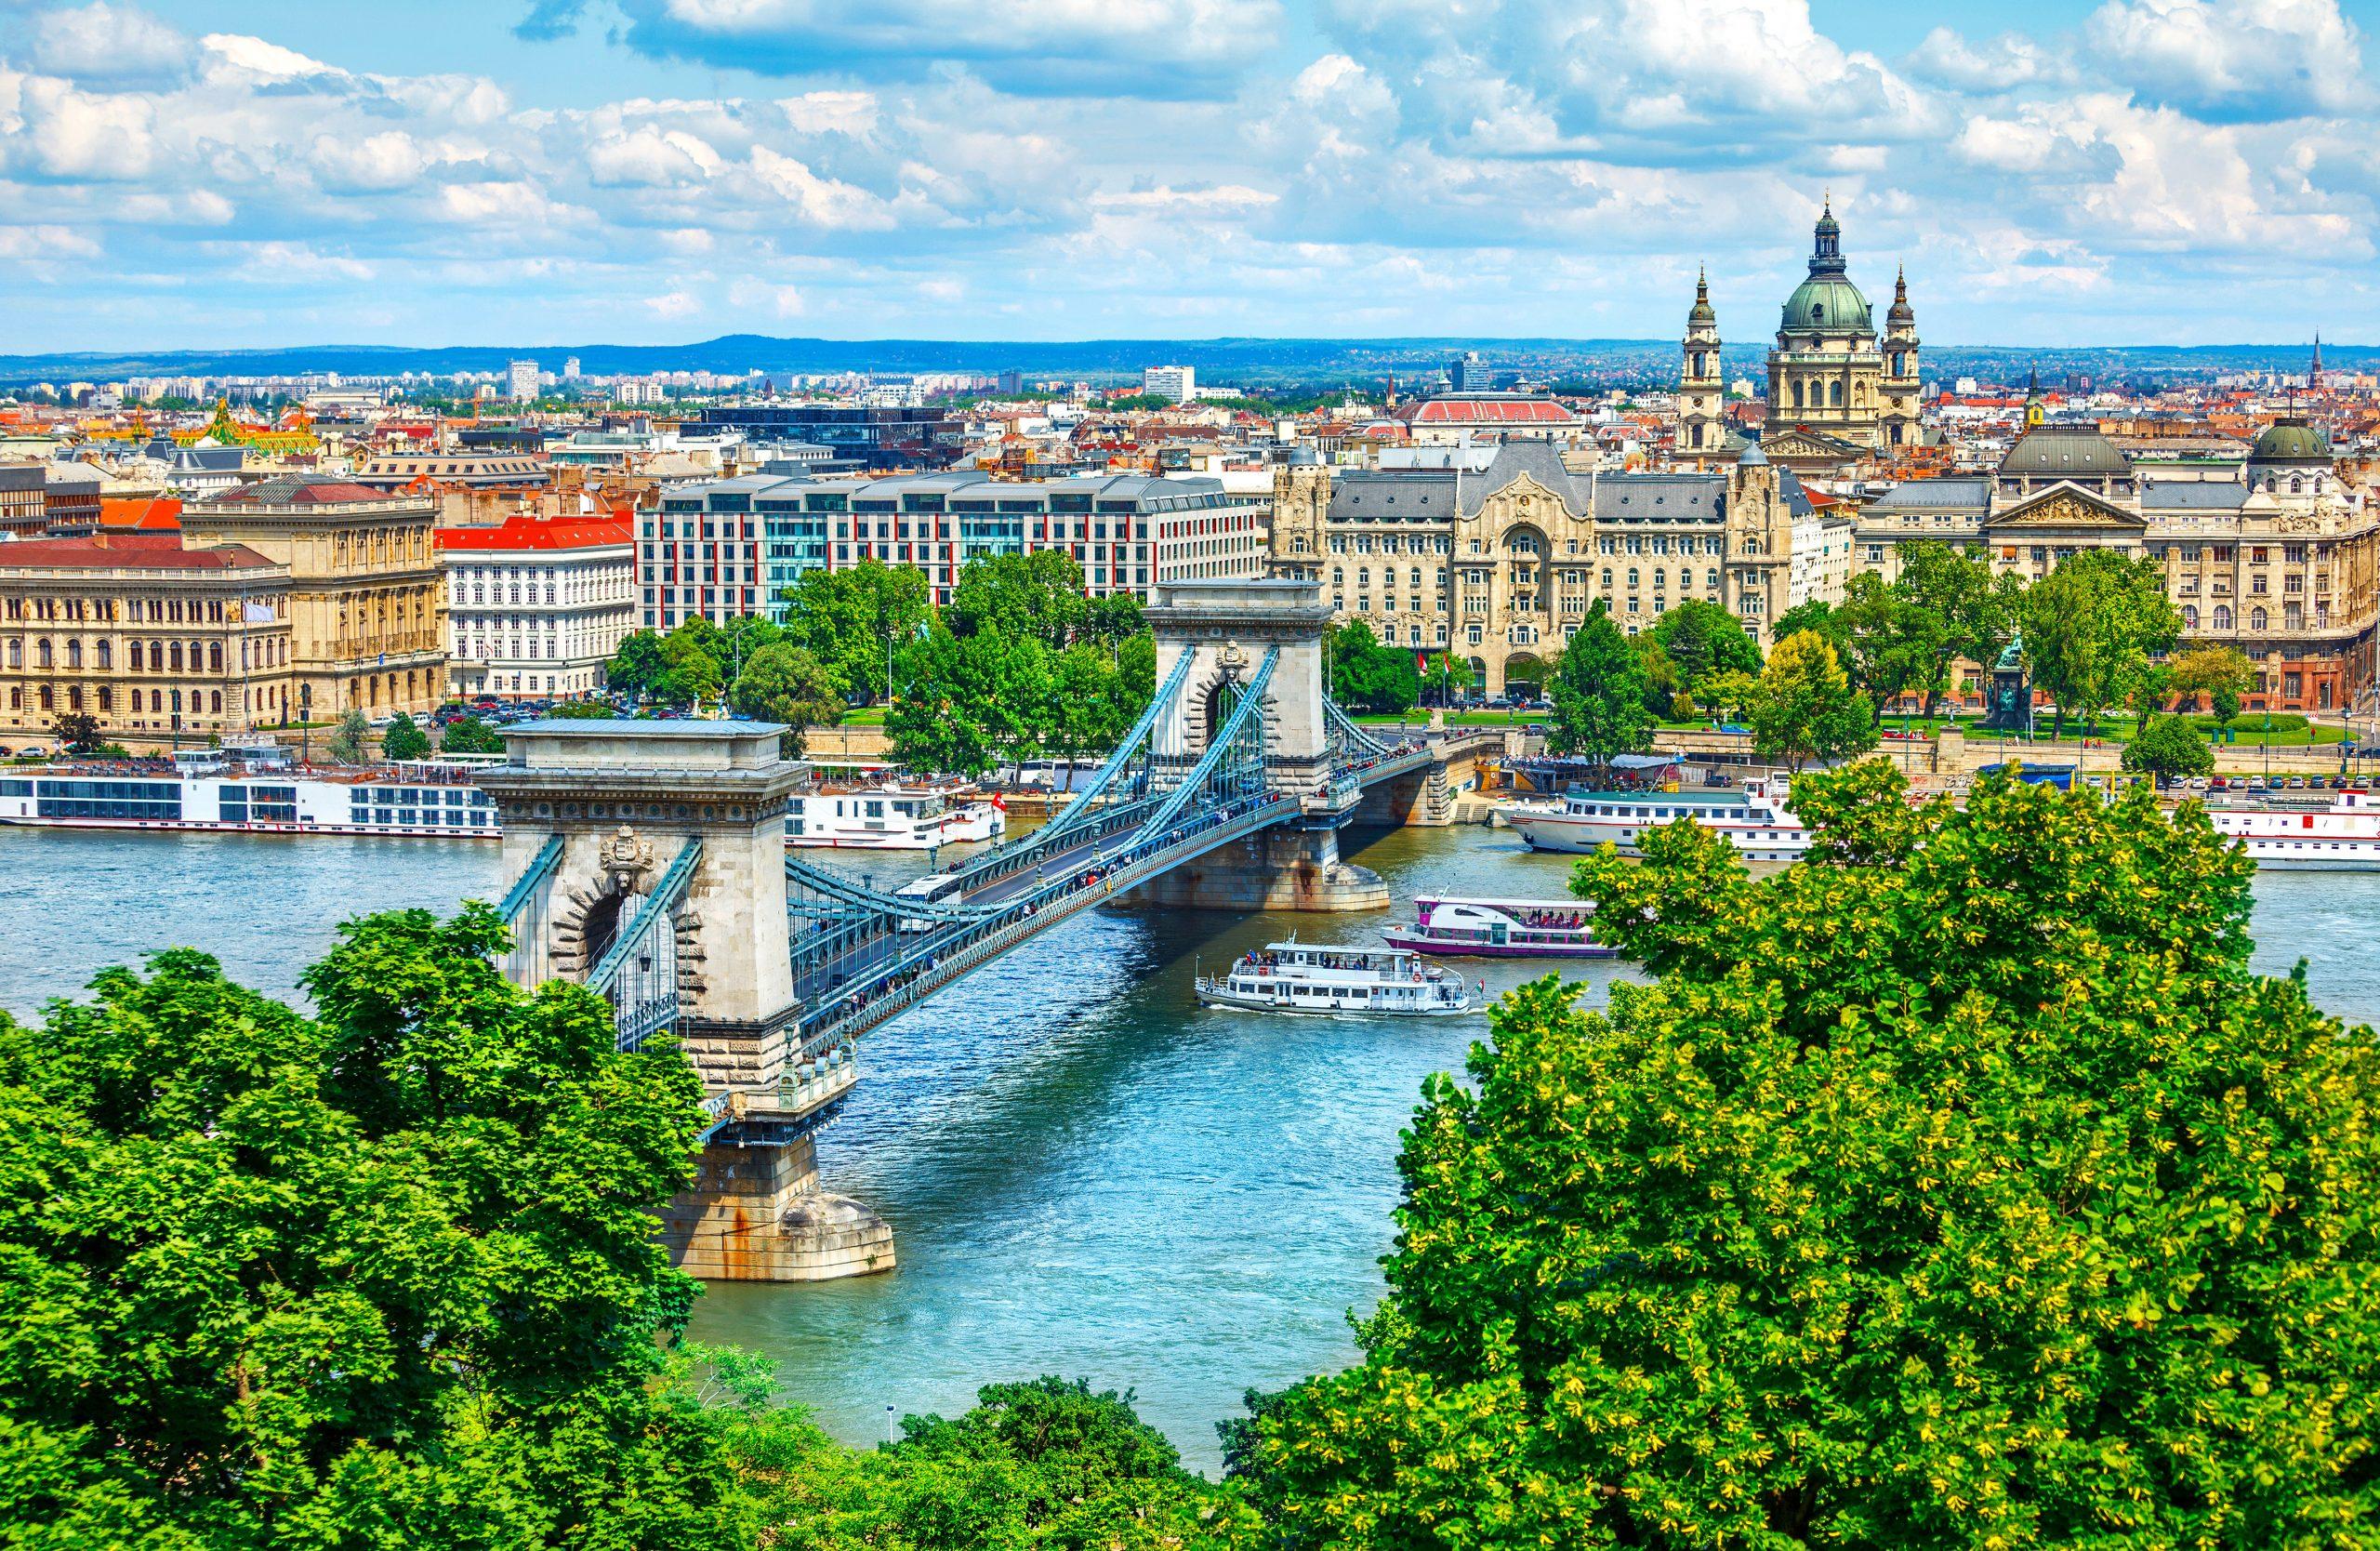 Enjoy An Amazing 2 Day Budapest Tour From Zagreb